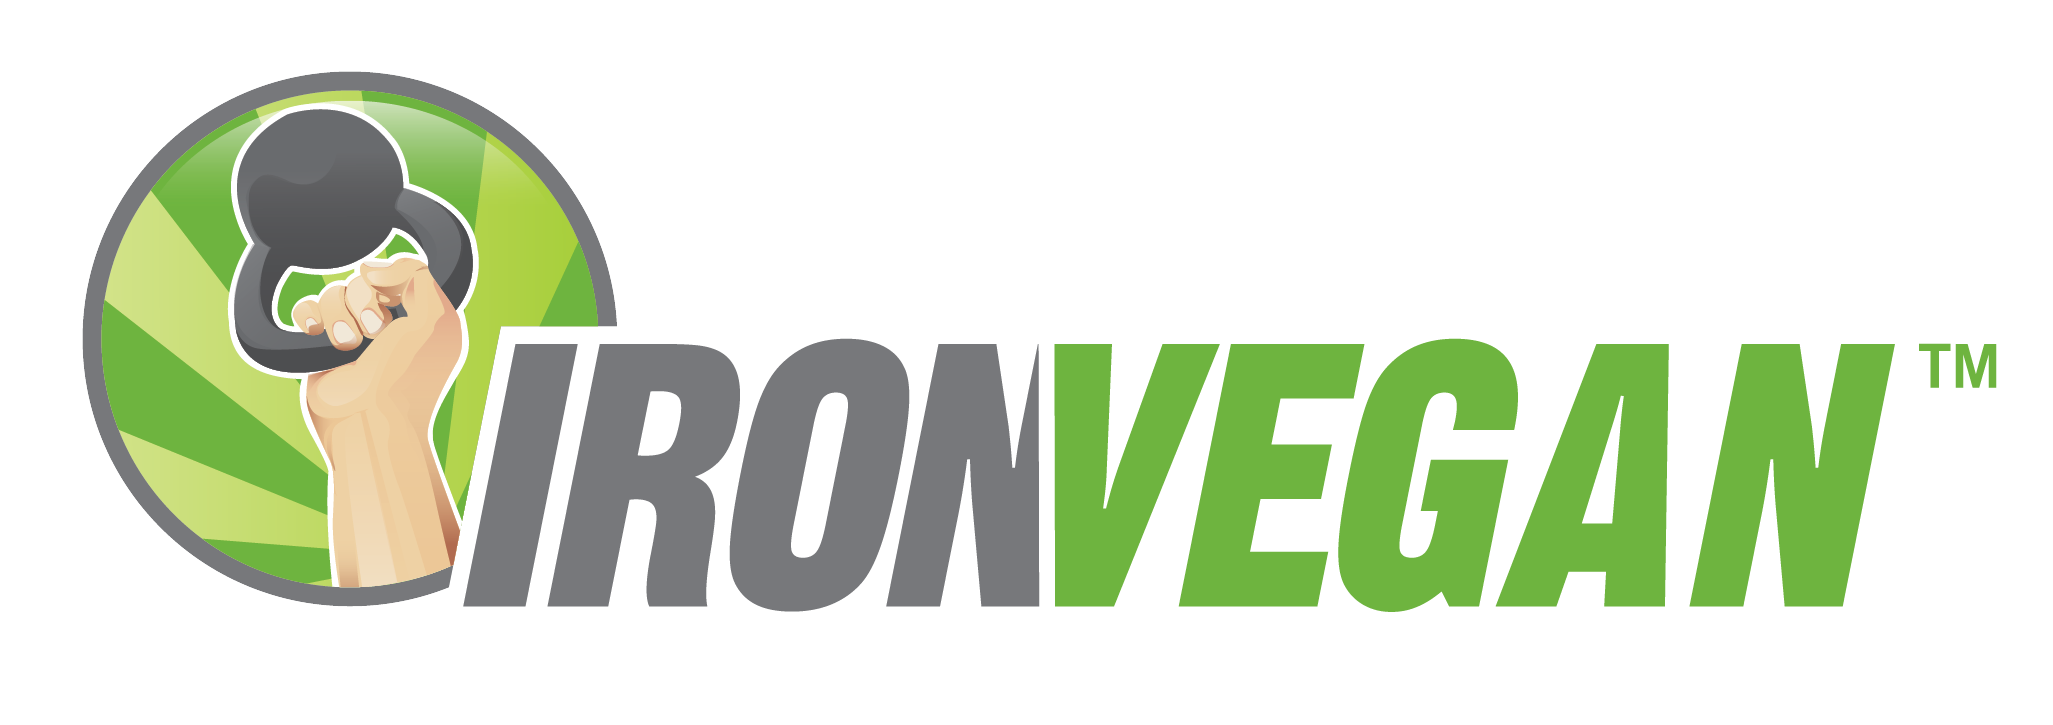 IronVegan